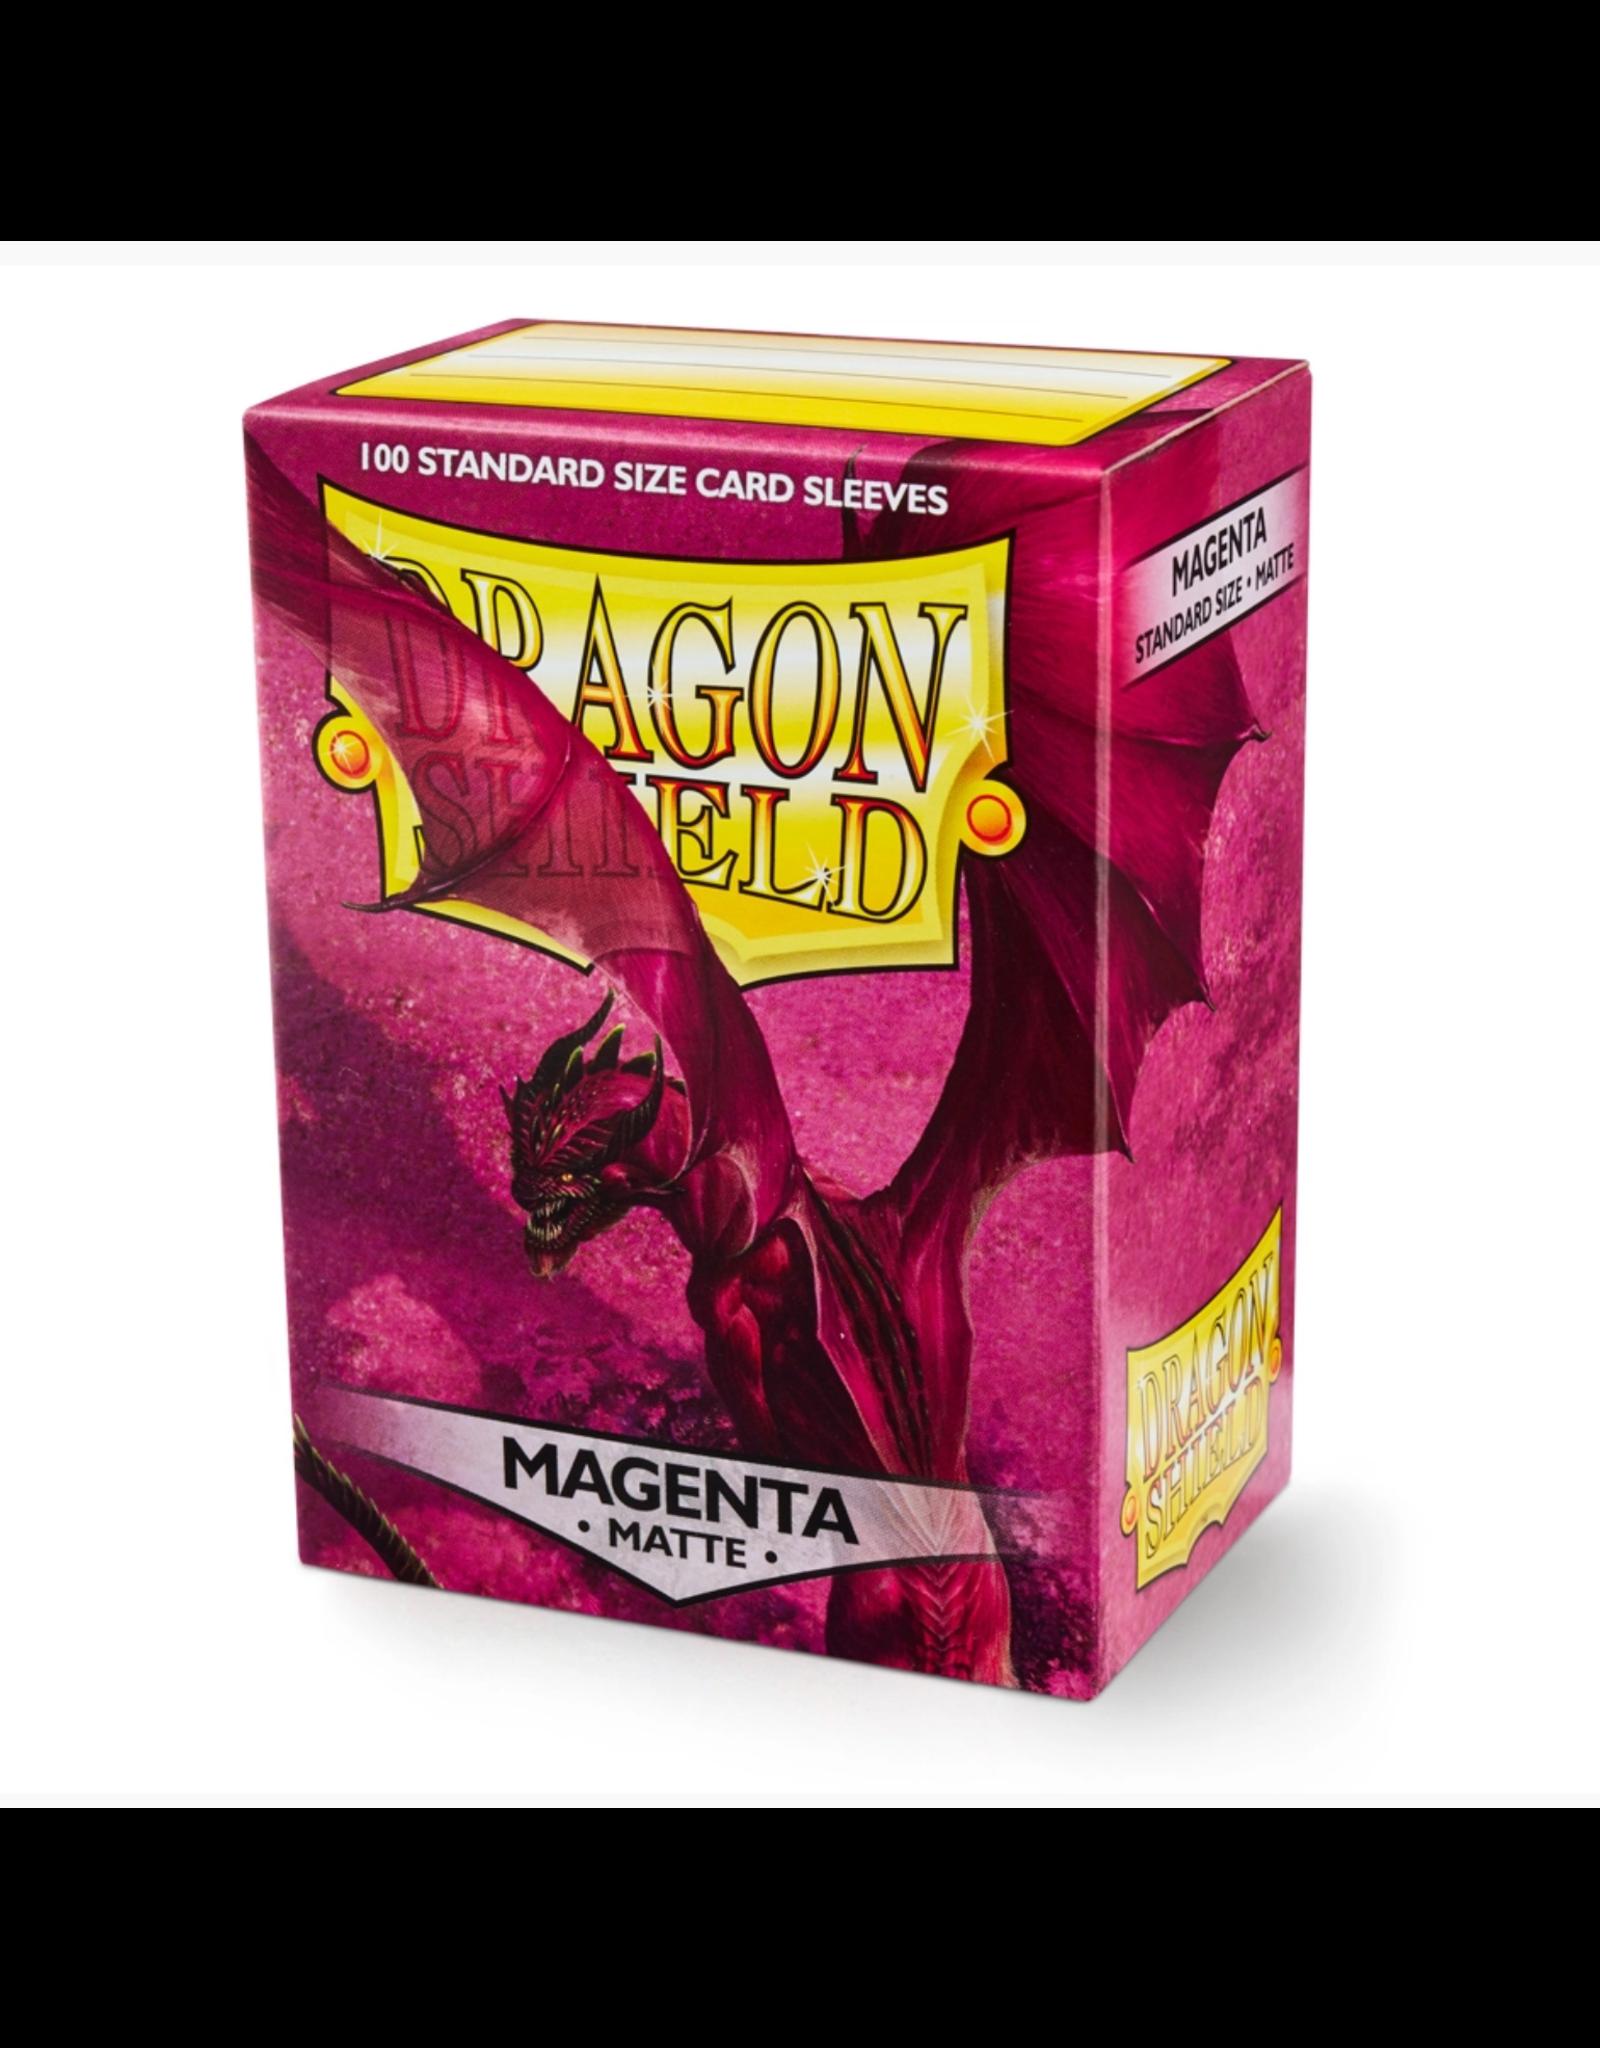 Arcane Tinmen Dragon Shield: Matte Magenta Card Sleeves 100 Count